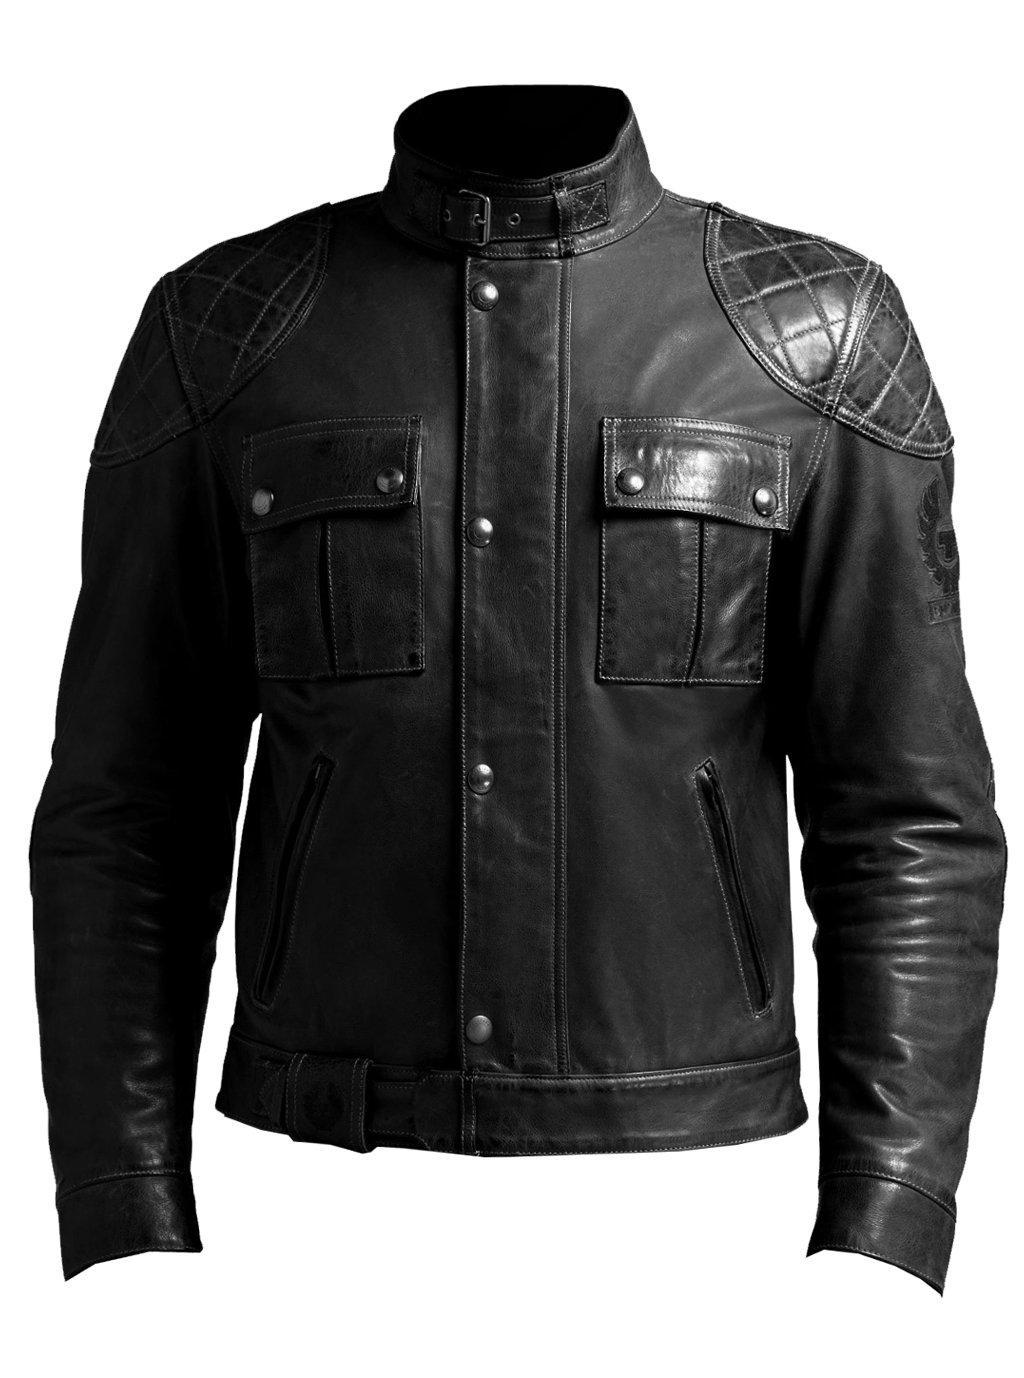 VearFit Smooth fashion Regular Big & Tall Size Black genuine leather jacket for men, XX-Large, Black